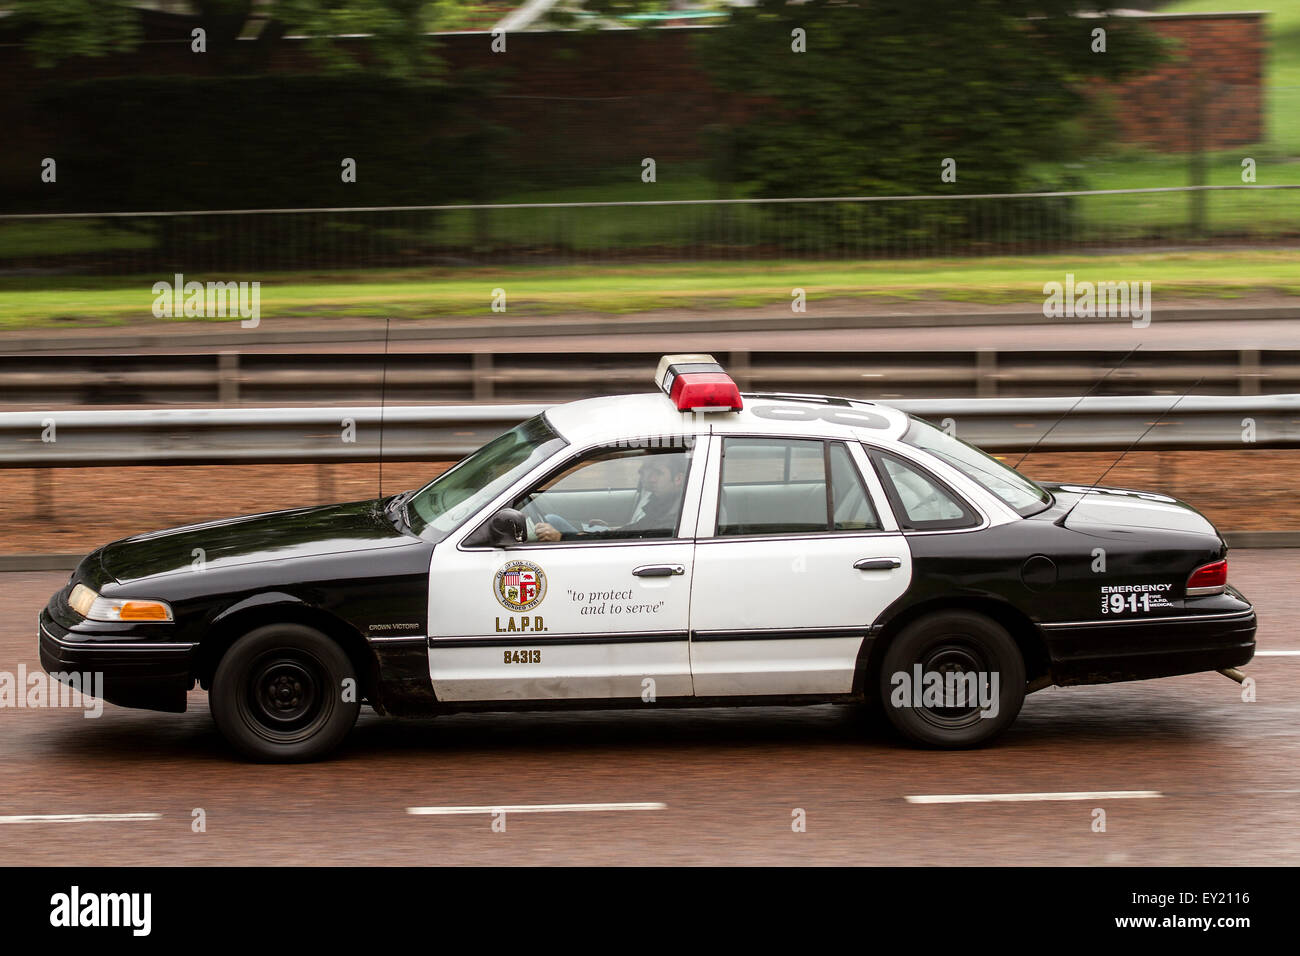 Crown Car Service